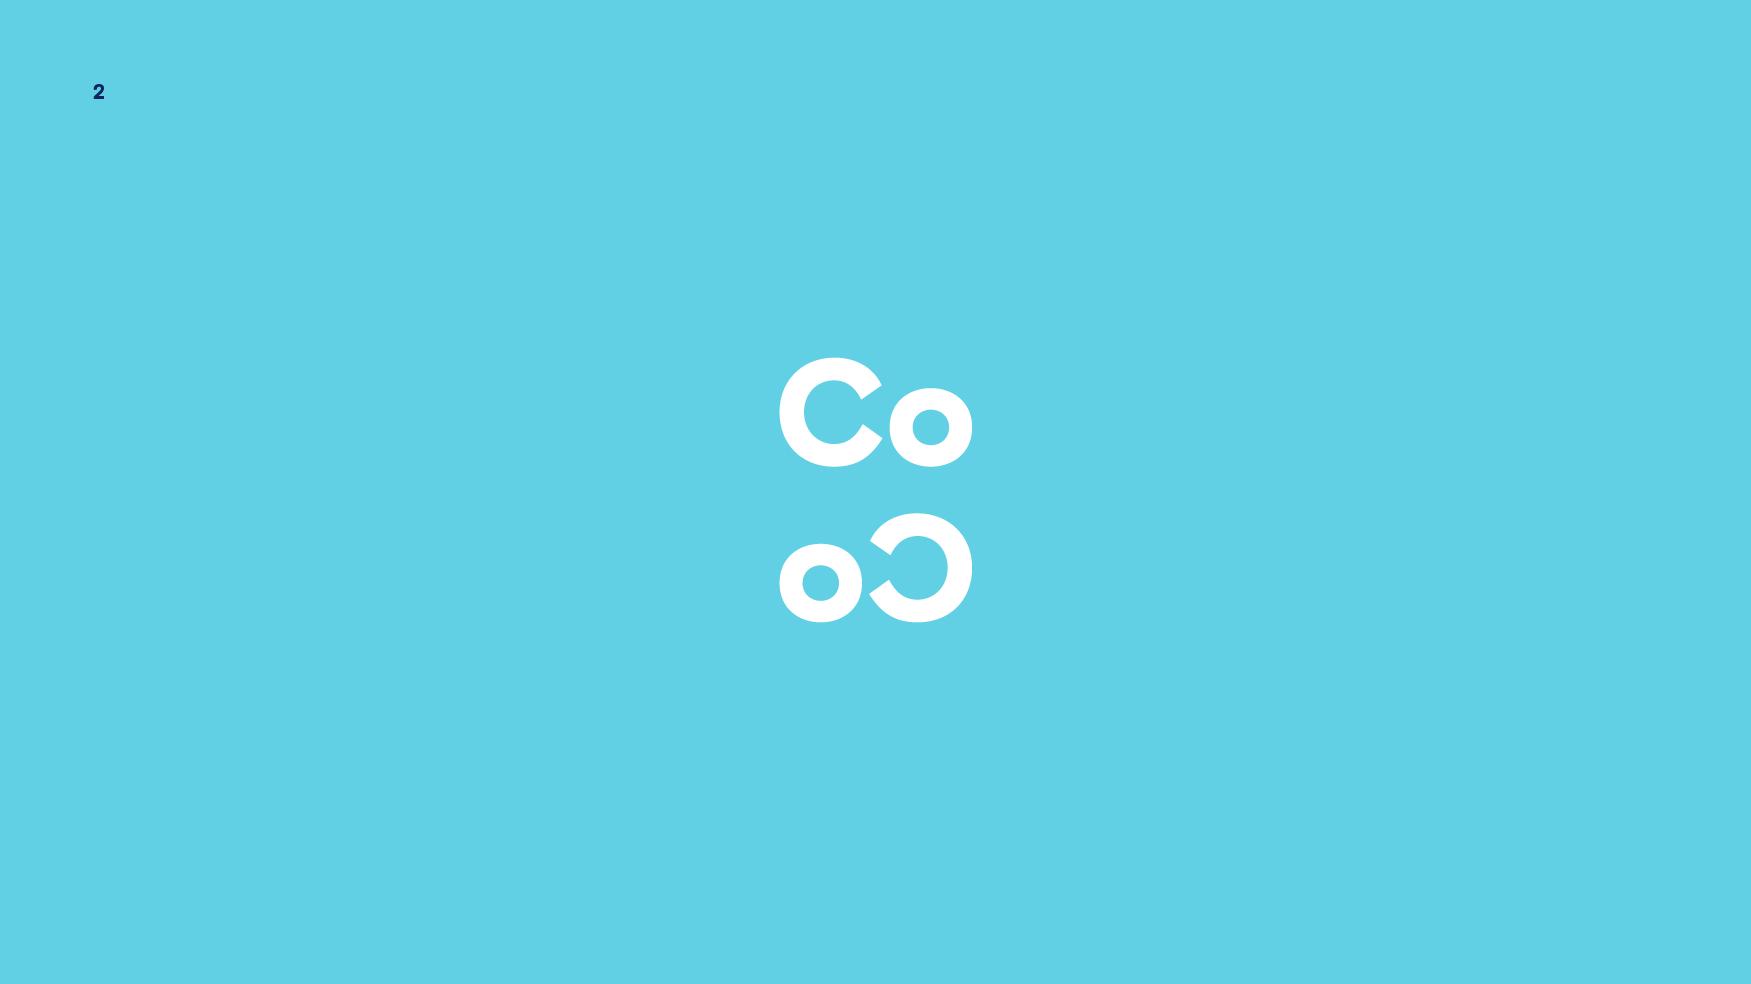 Conny_Co_A5